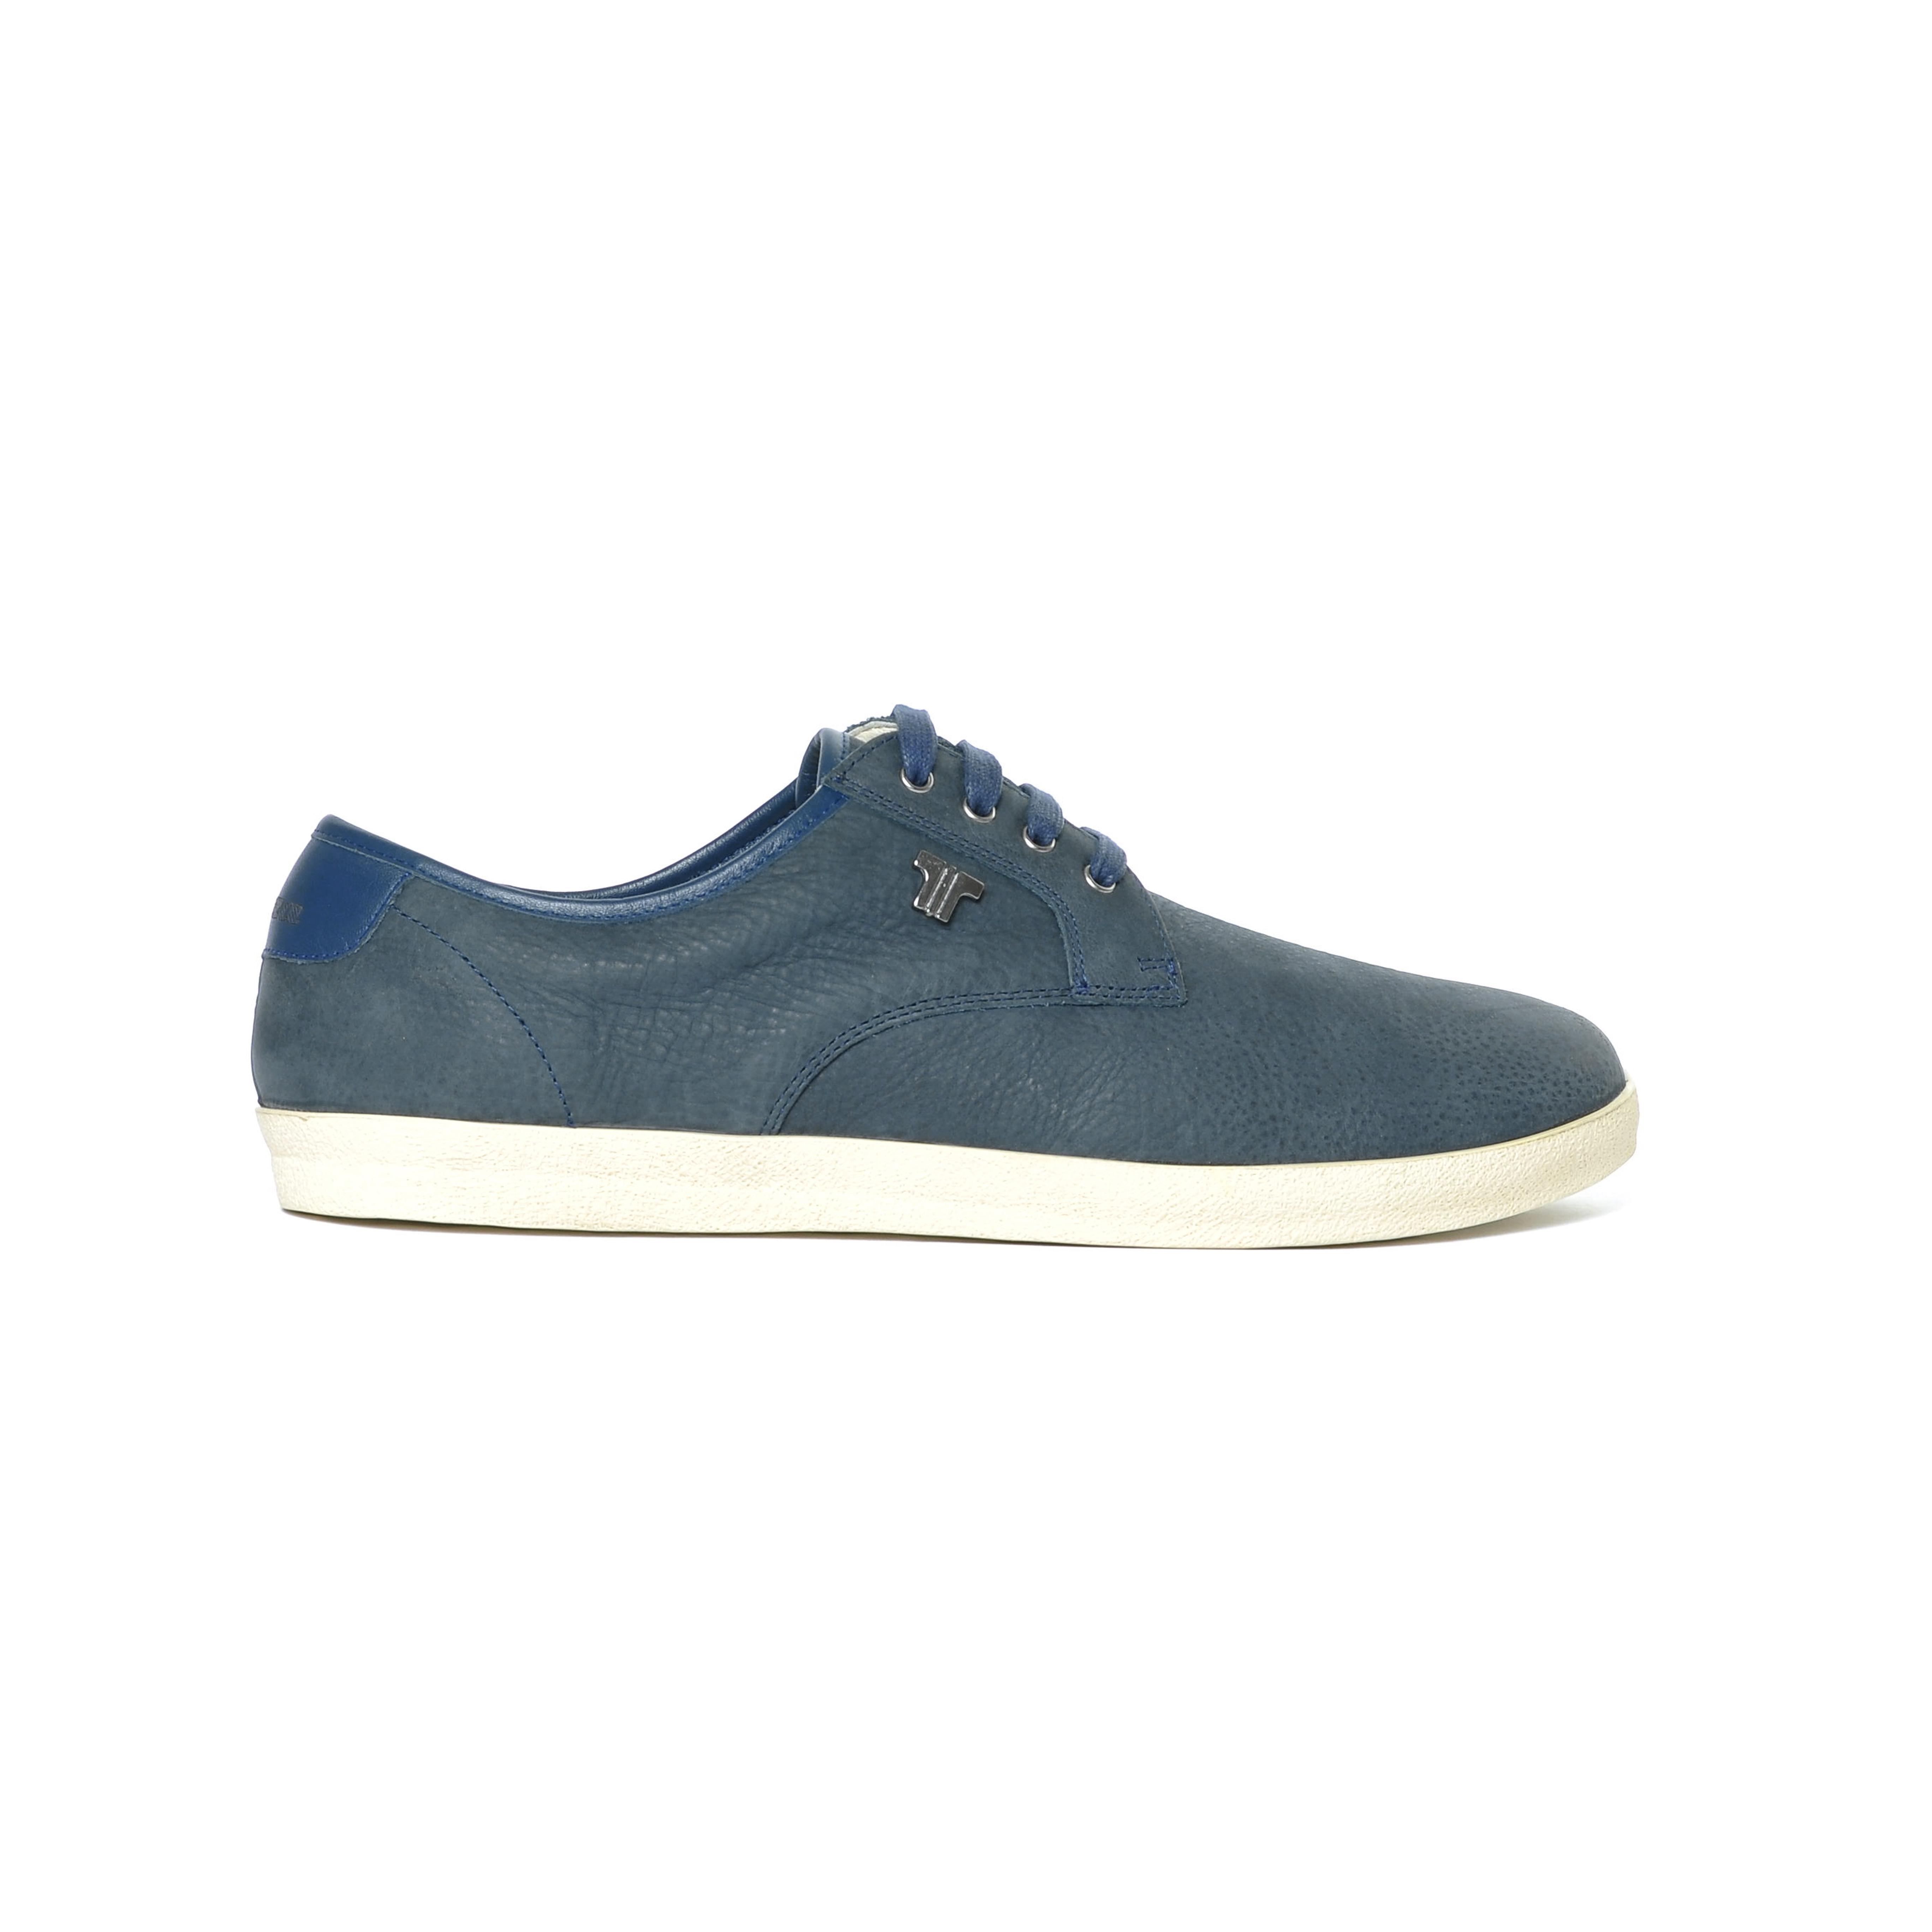 Tisza shoes - City - Navy